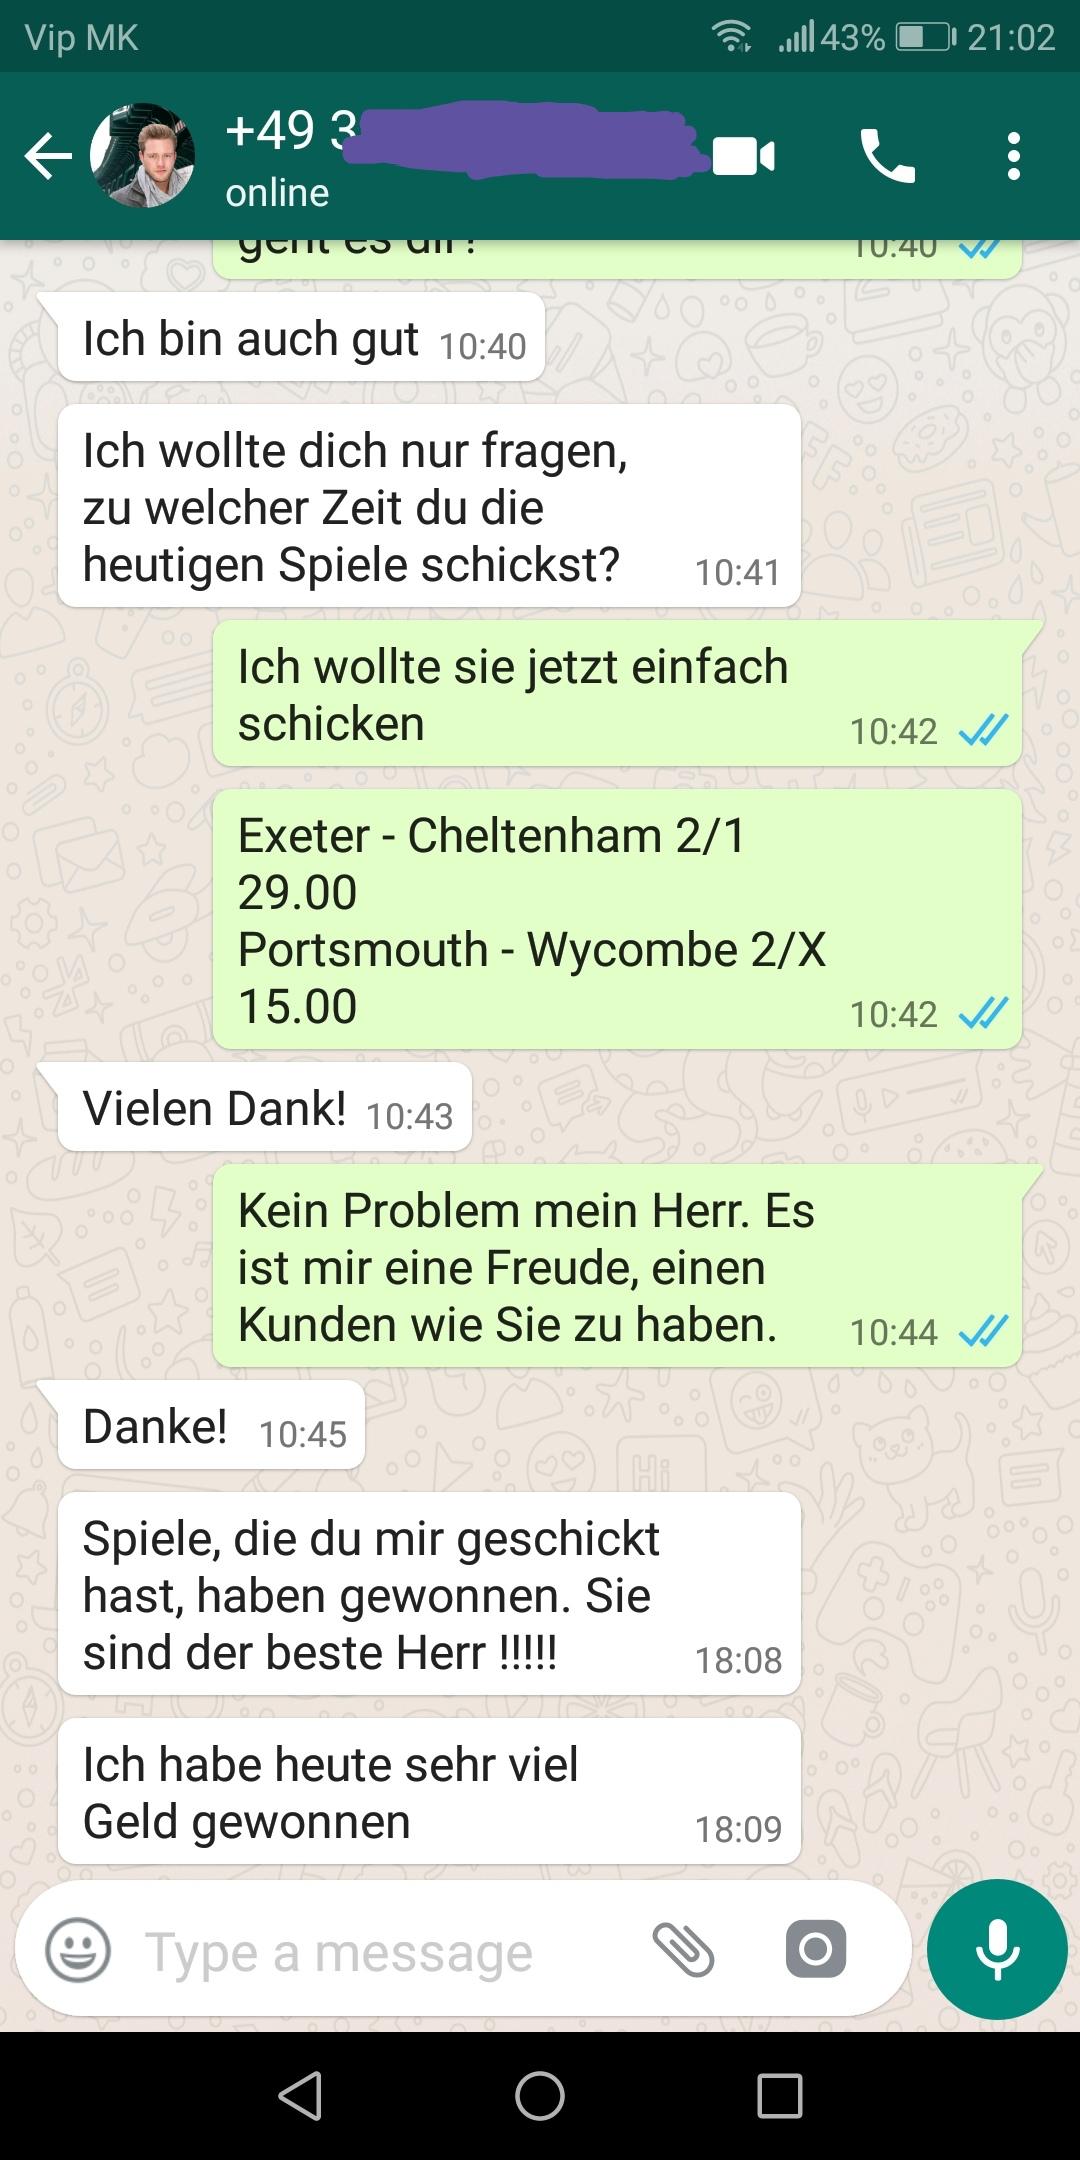 WhatsApp proof ht ft 22 09 2018